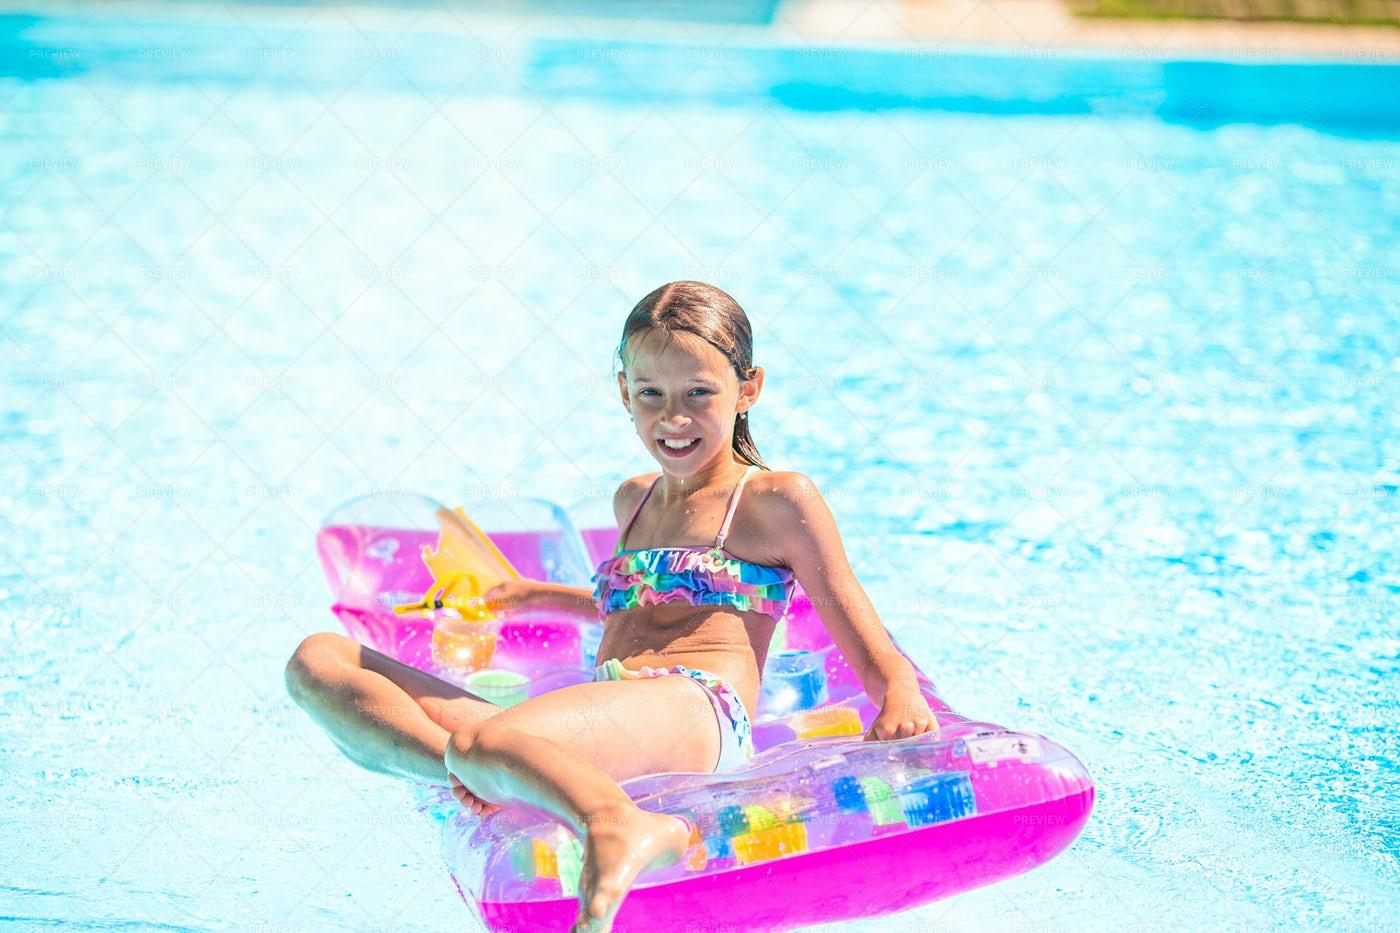 Girl Sitting On Inflatable Raft: Stock Photos